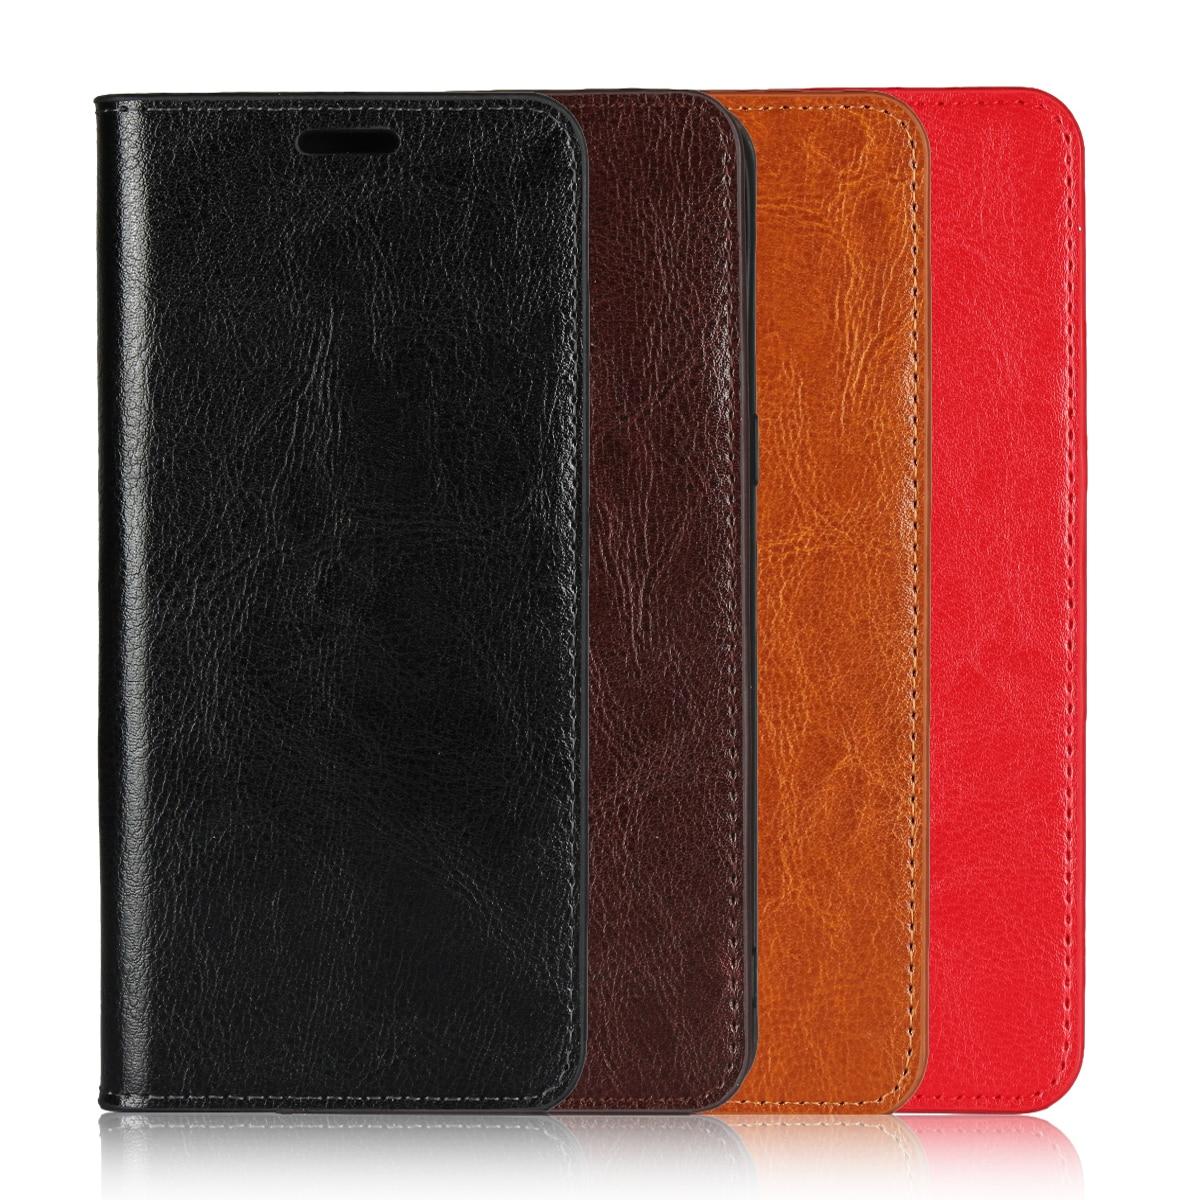 For Motorola Moto Edge Plus Case 6.7 Inch Premium Natural Genuine Flip Leather Skin Wallet Book Cover For Moto Edge+ Phone Case